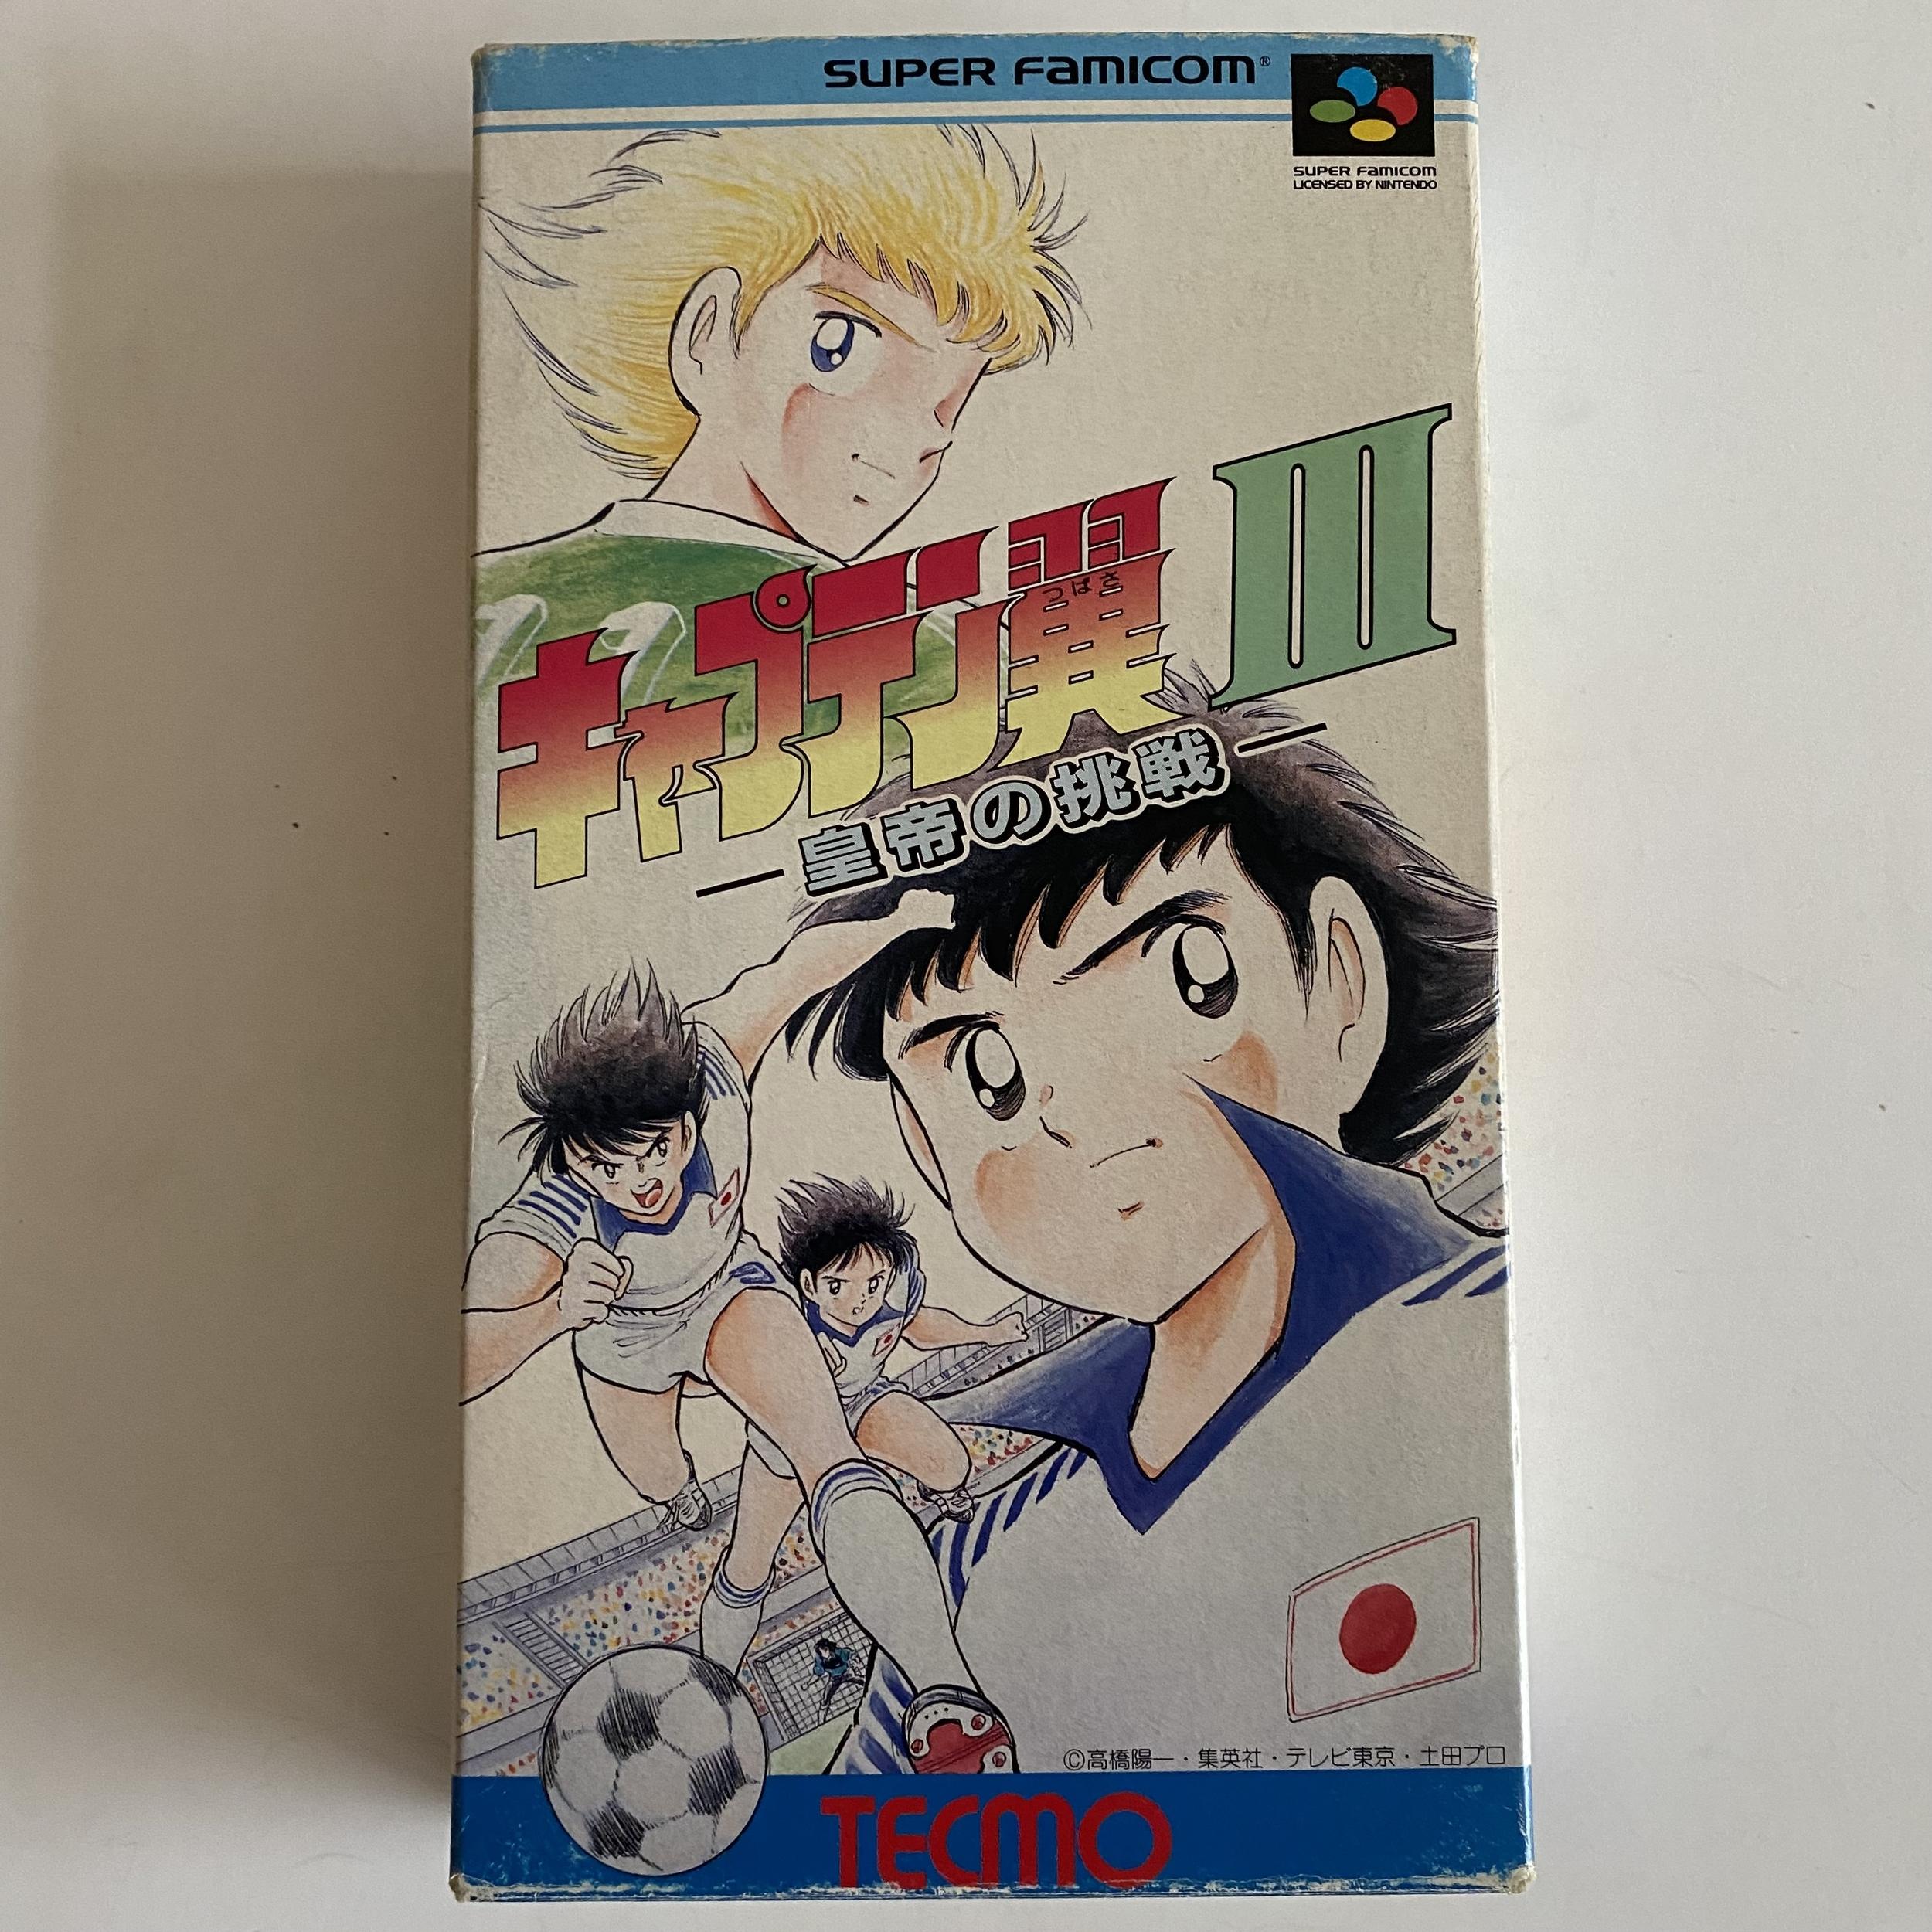 Captain Tsubasa 3: Koutei no Chousen - Super Famicom